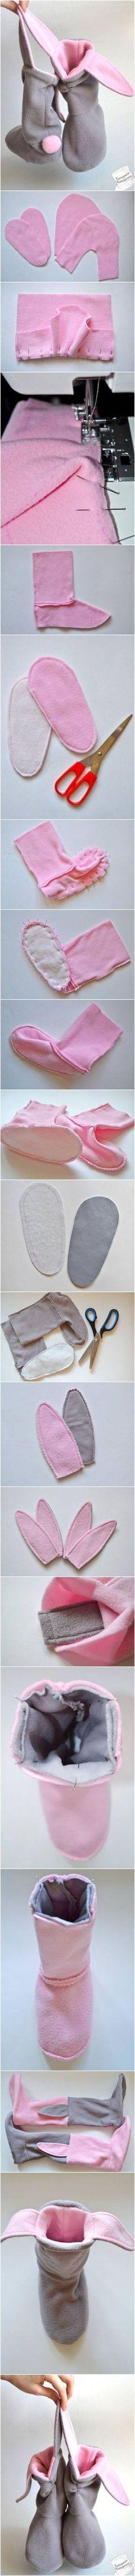 Knitting Patterns For Kids DIY Lovely Bunny Slippers Sewing Slippers, Bunny Slippers, Fabric Crafts, Sewing Crafts, Sewing Projects, Knitting Patterns, Sewing Patterns, Crochet Patterns, Diy Clothing